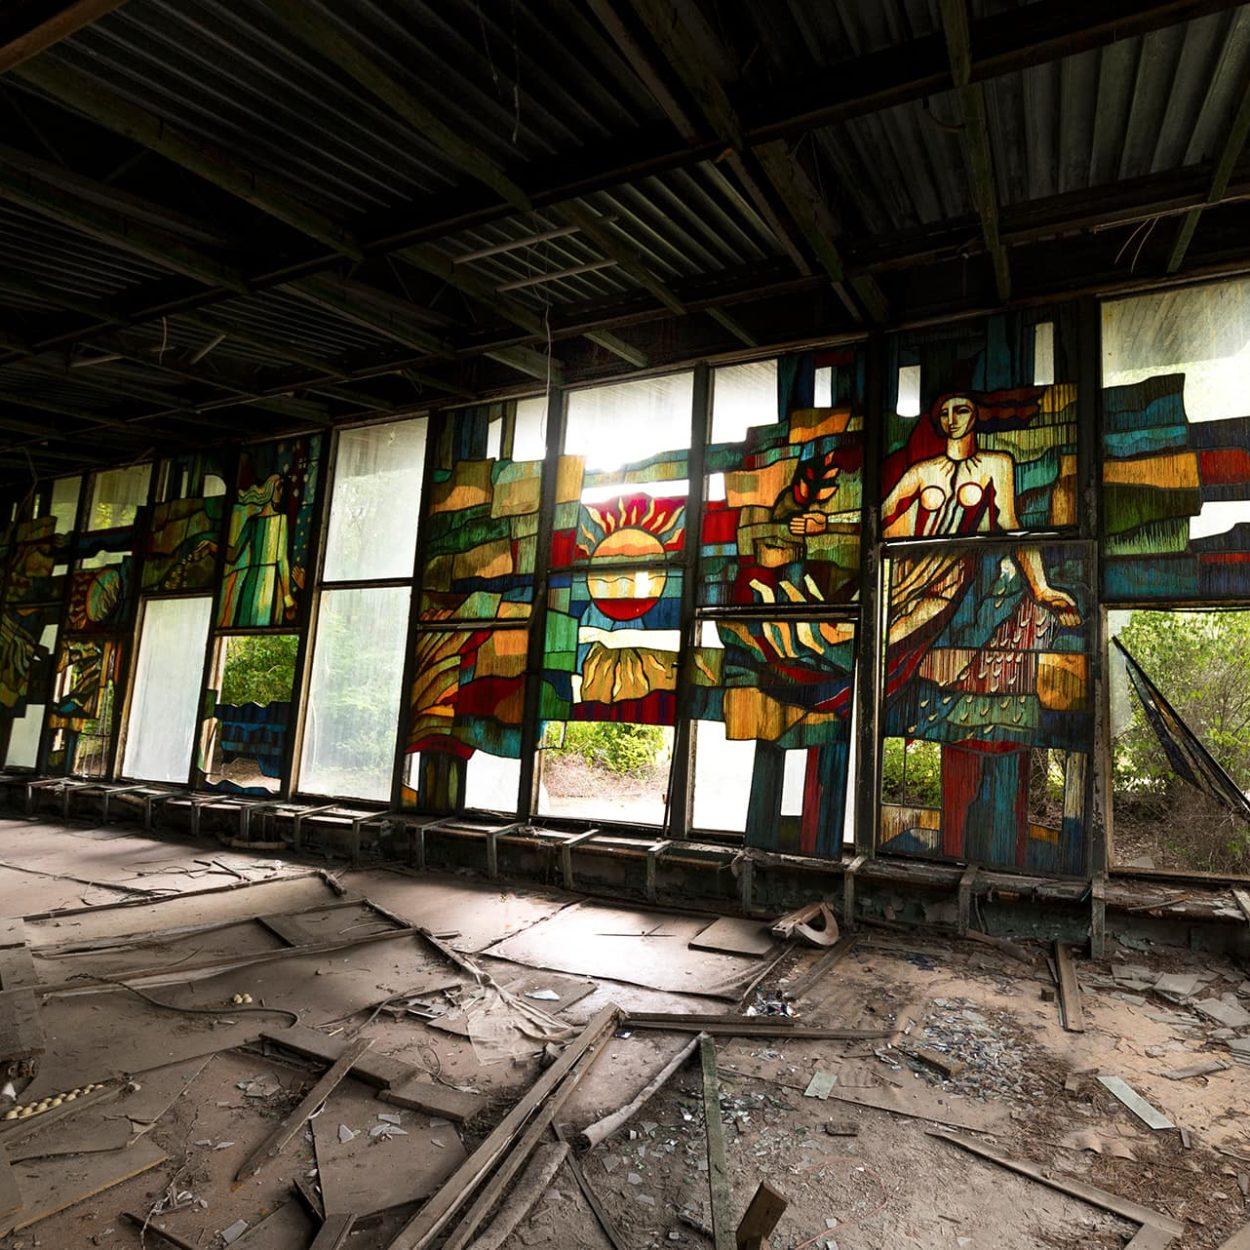 urbex-urban-exploration-ukraine-tchernobyl-pripiat-bar